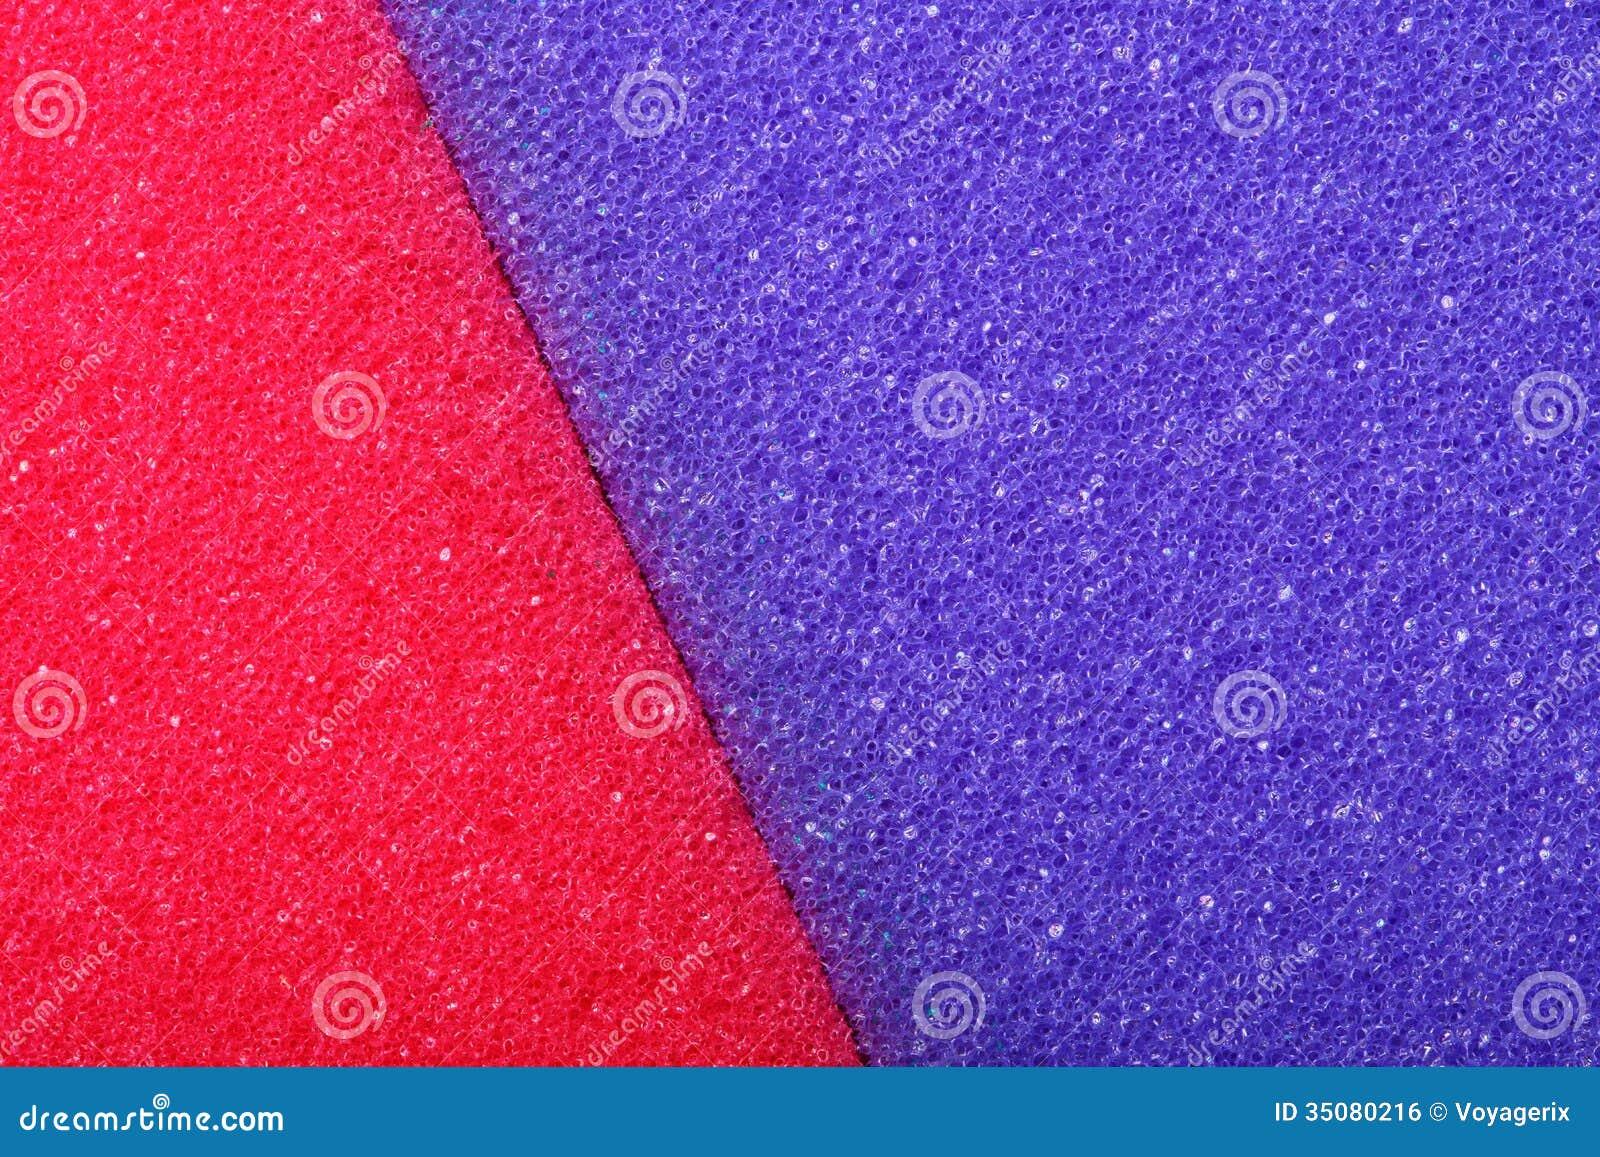 Красочная предпосылка губки пены целлюлозы текстуры